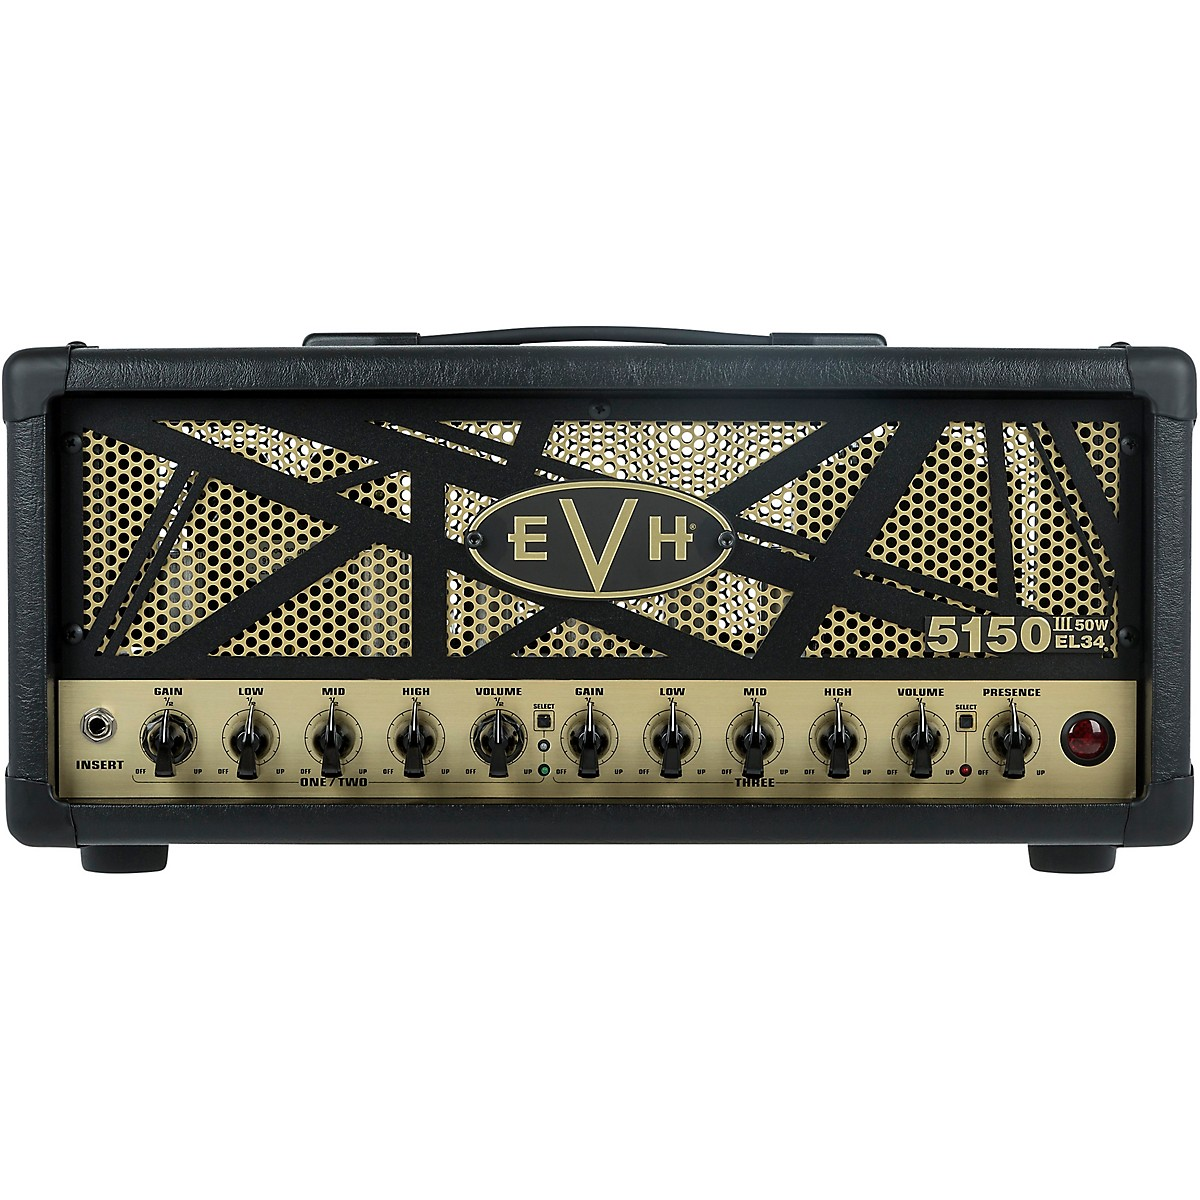 EVH 5150III 50W EL34 50W Tube Guitar Amp Head